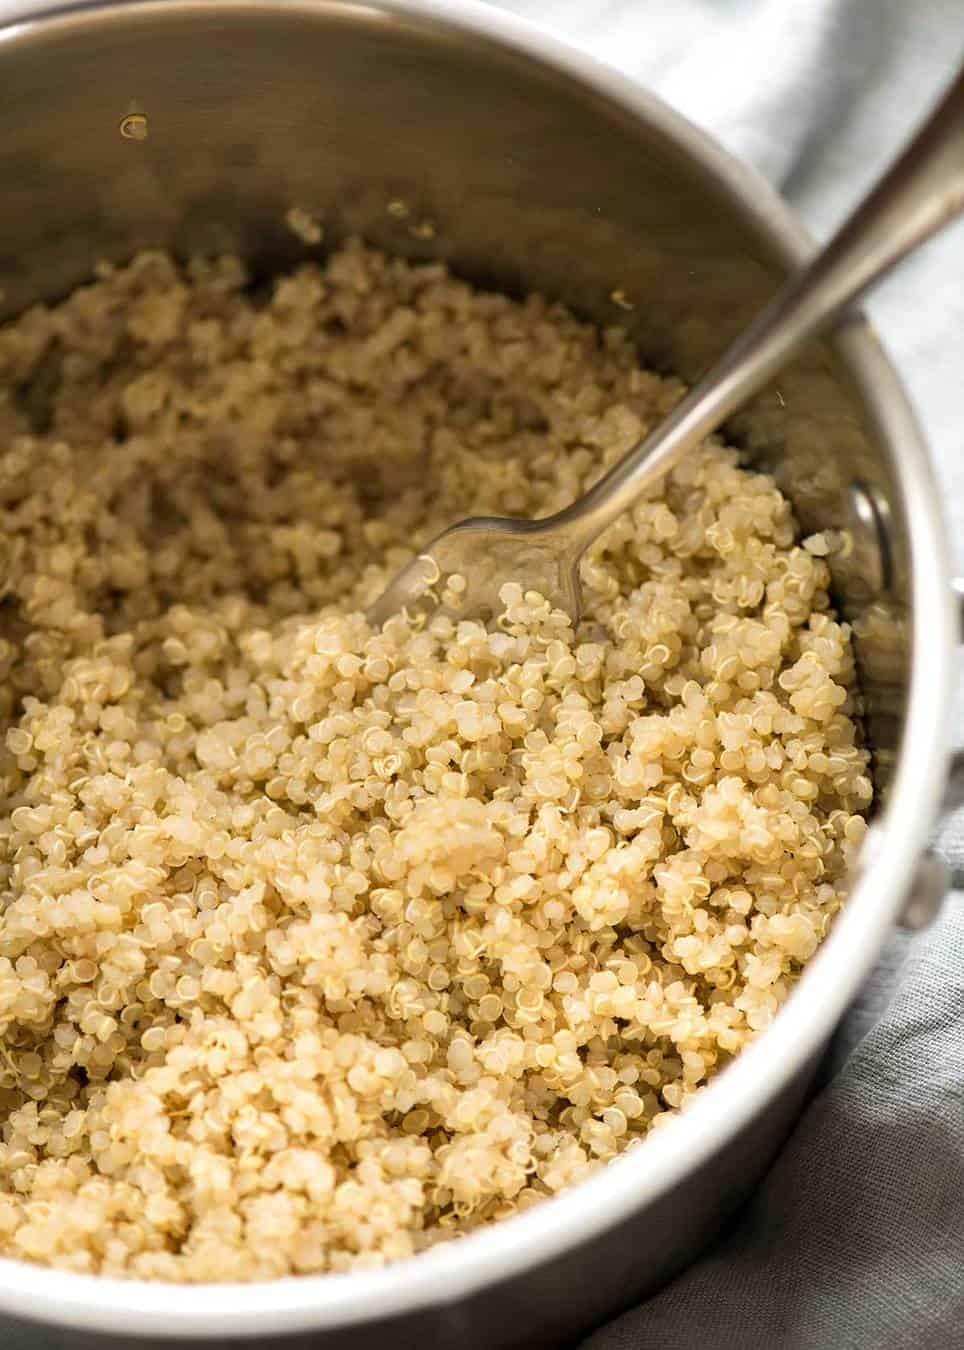 Cooked fluffy quinoa in a silver saucepan.